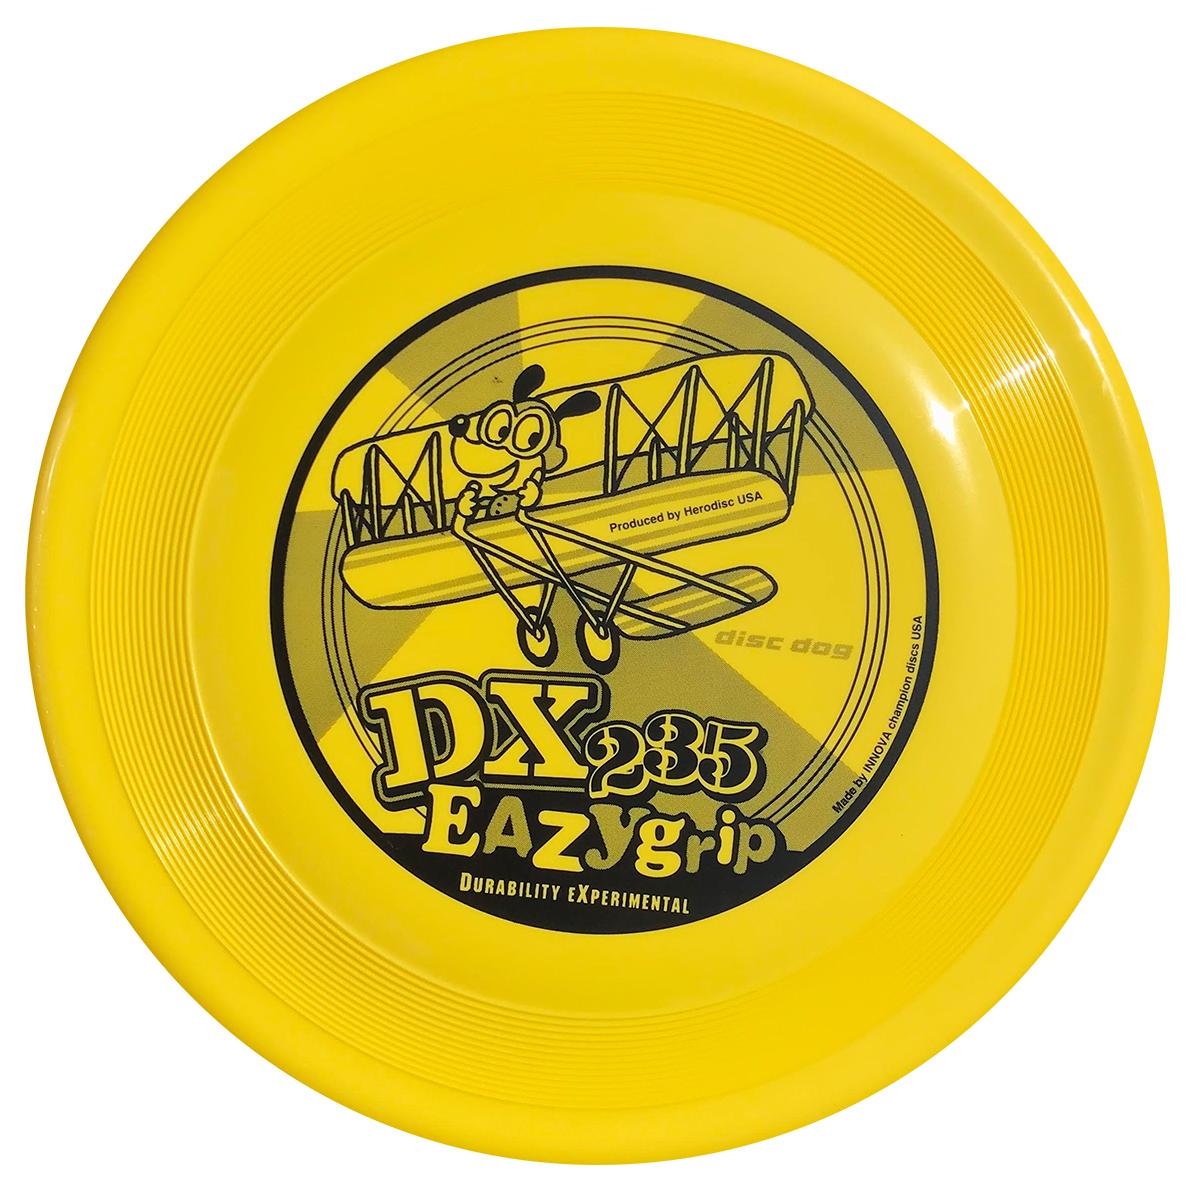 Hero DX 235 EAZY grip